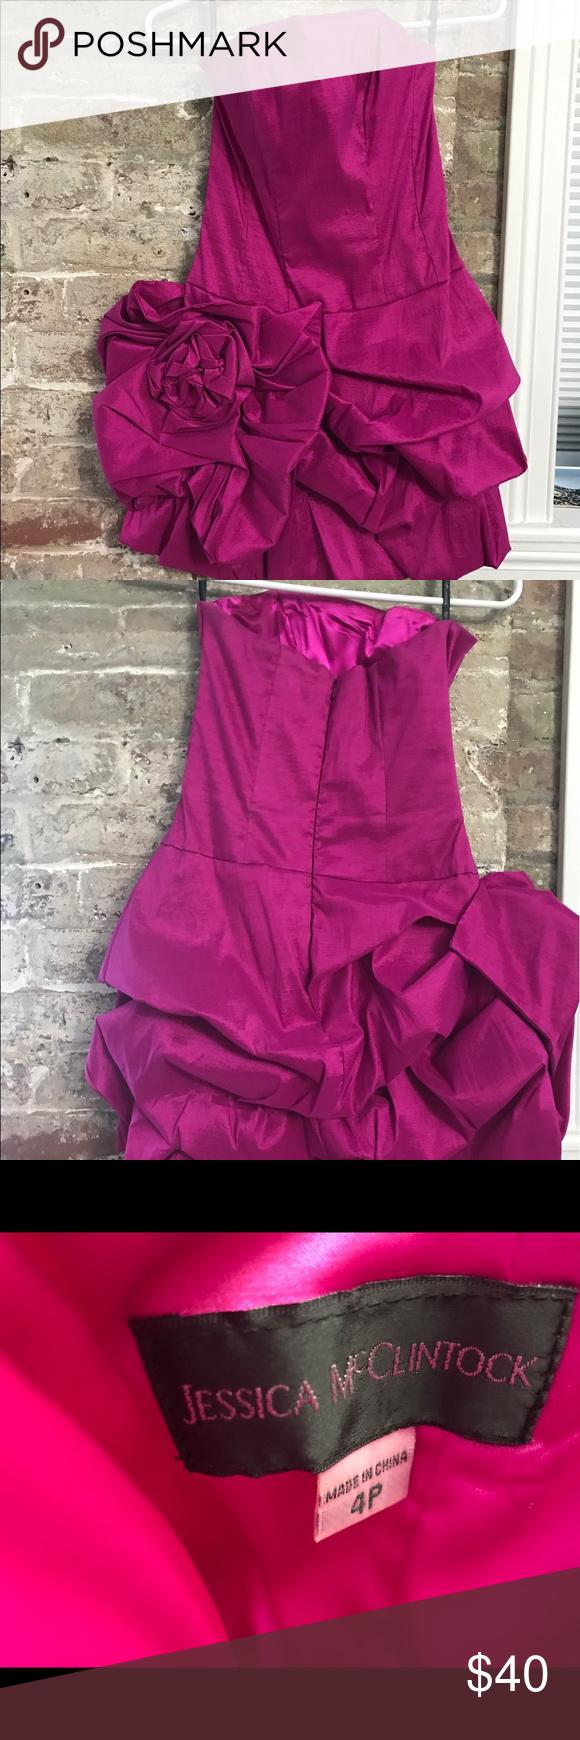 Moderno Jessica Mcclintock Cocktail Dress Bosquejo - Colección de ...